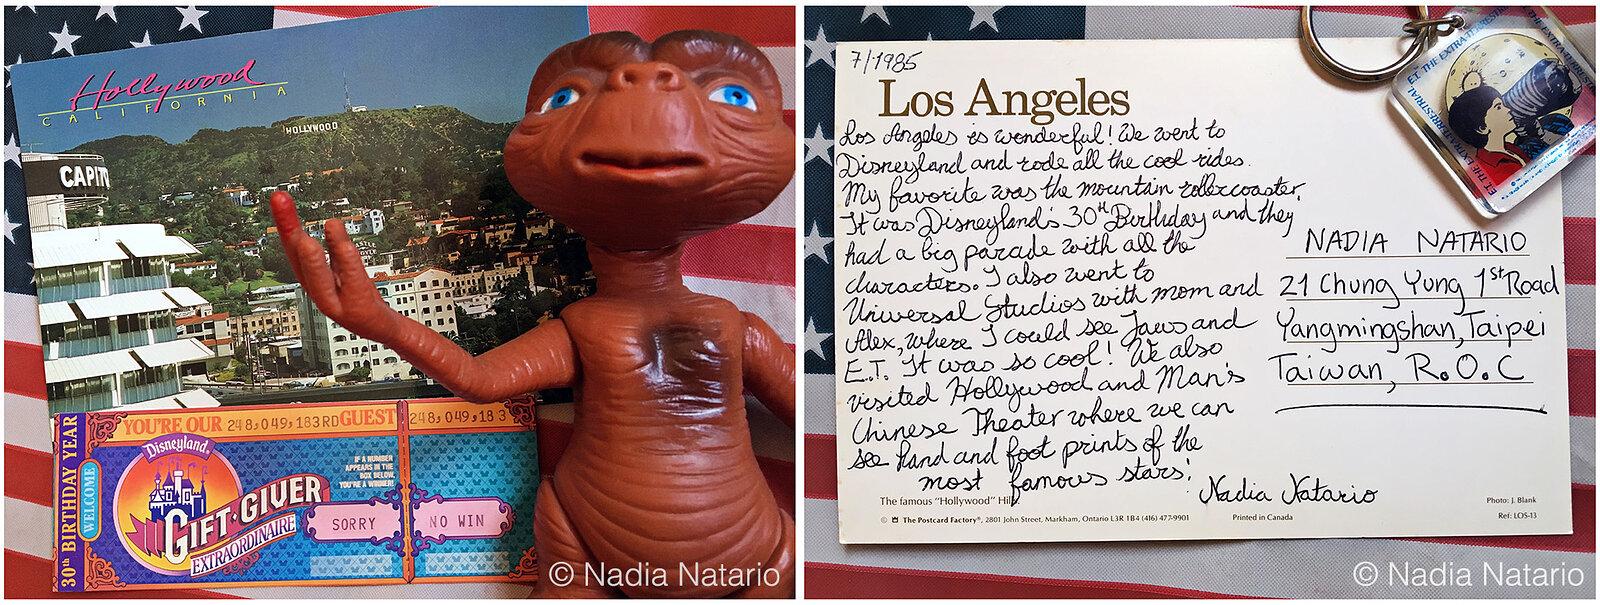 Postcards to Myself - Los Angeles, U.S.A, 1985